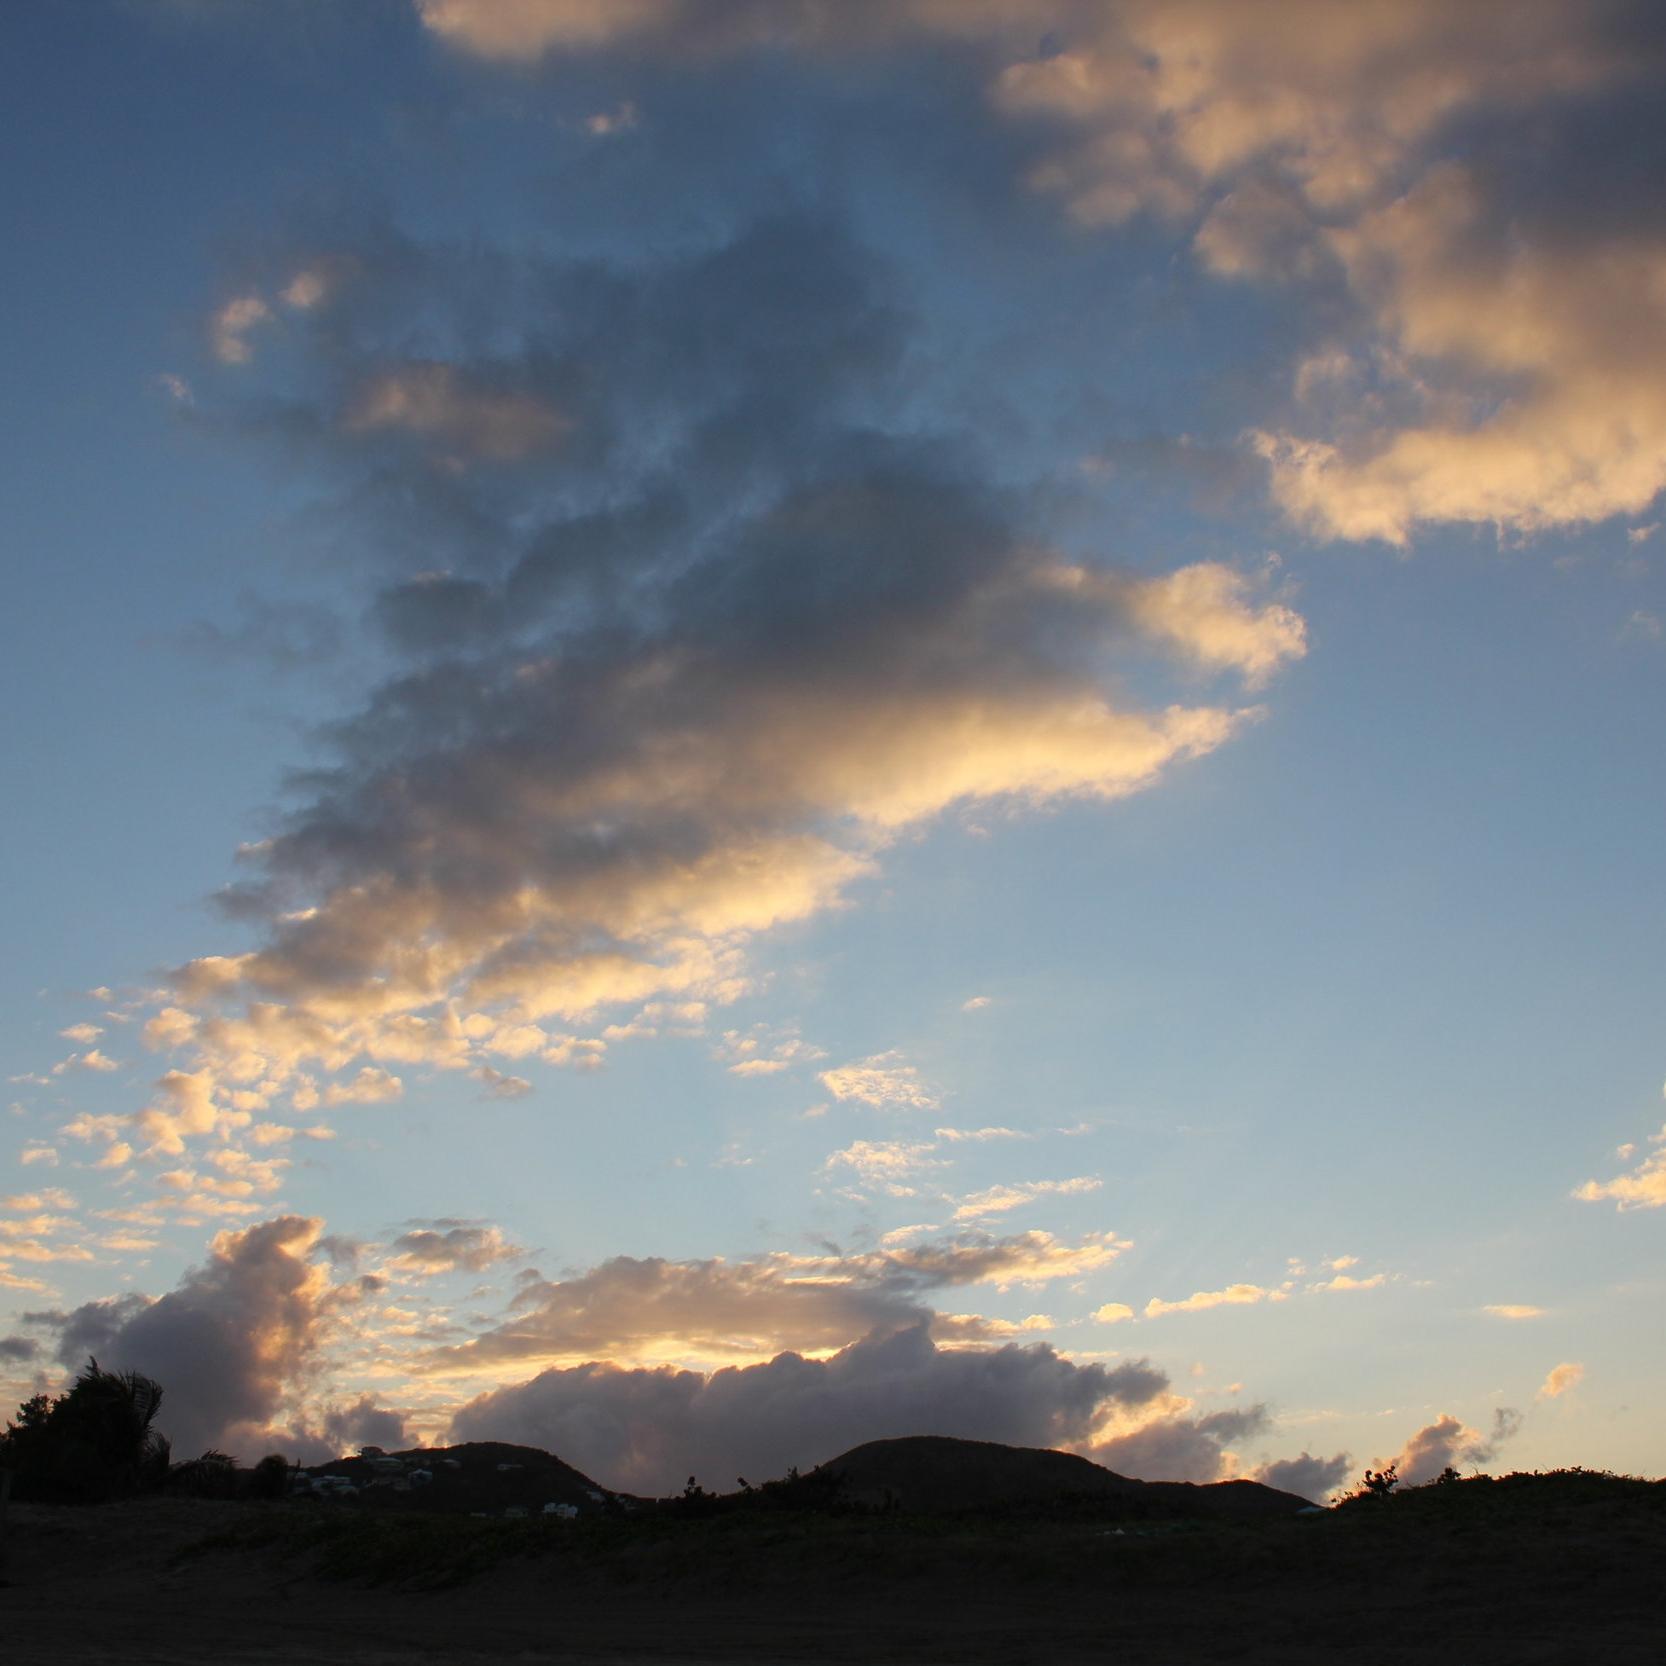 Frigate Bay sunset view